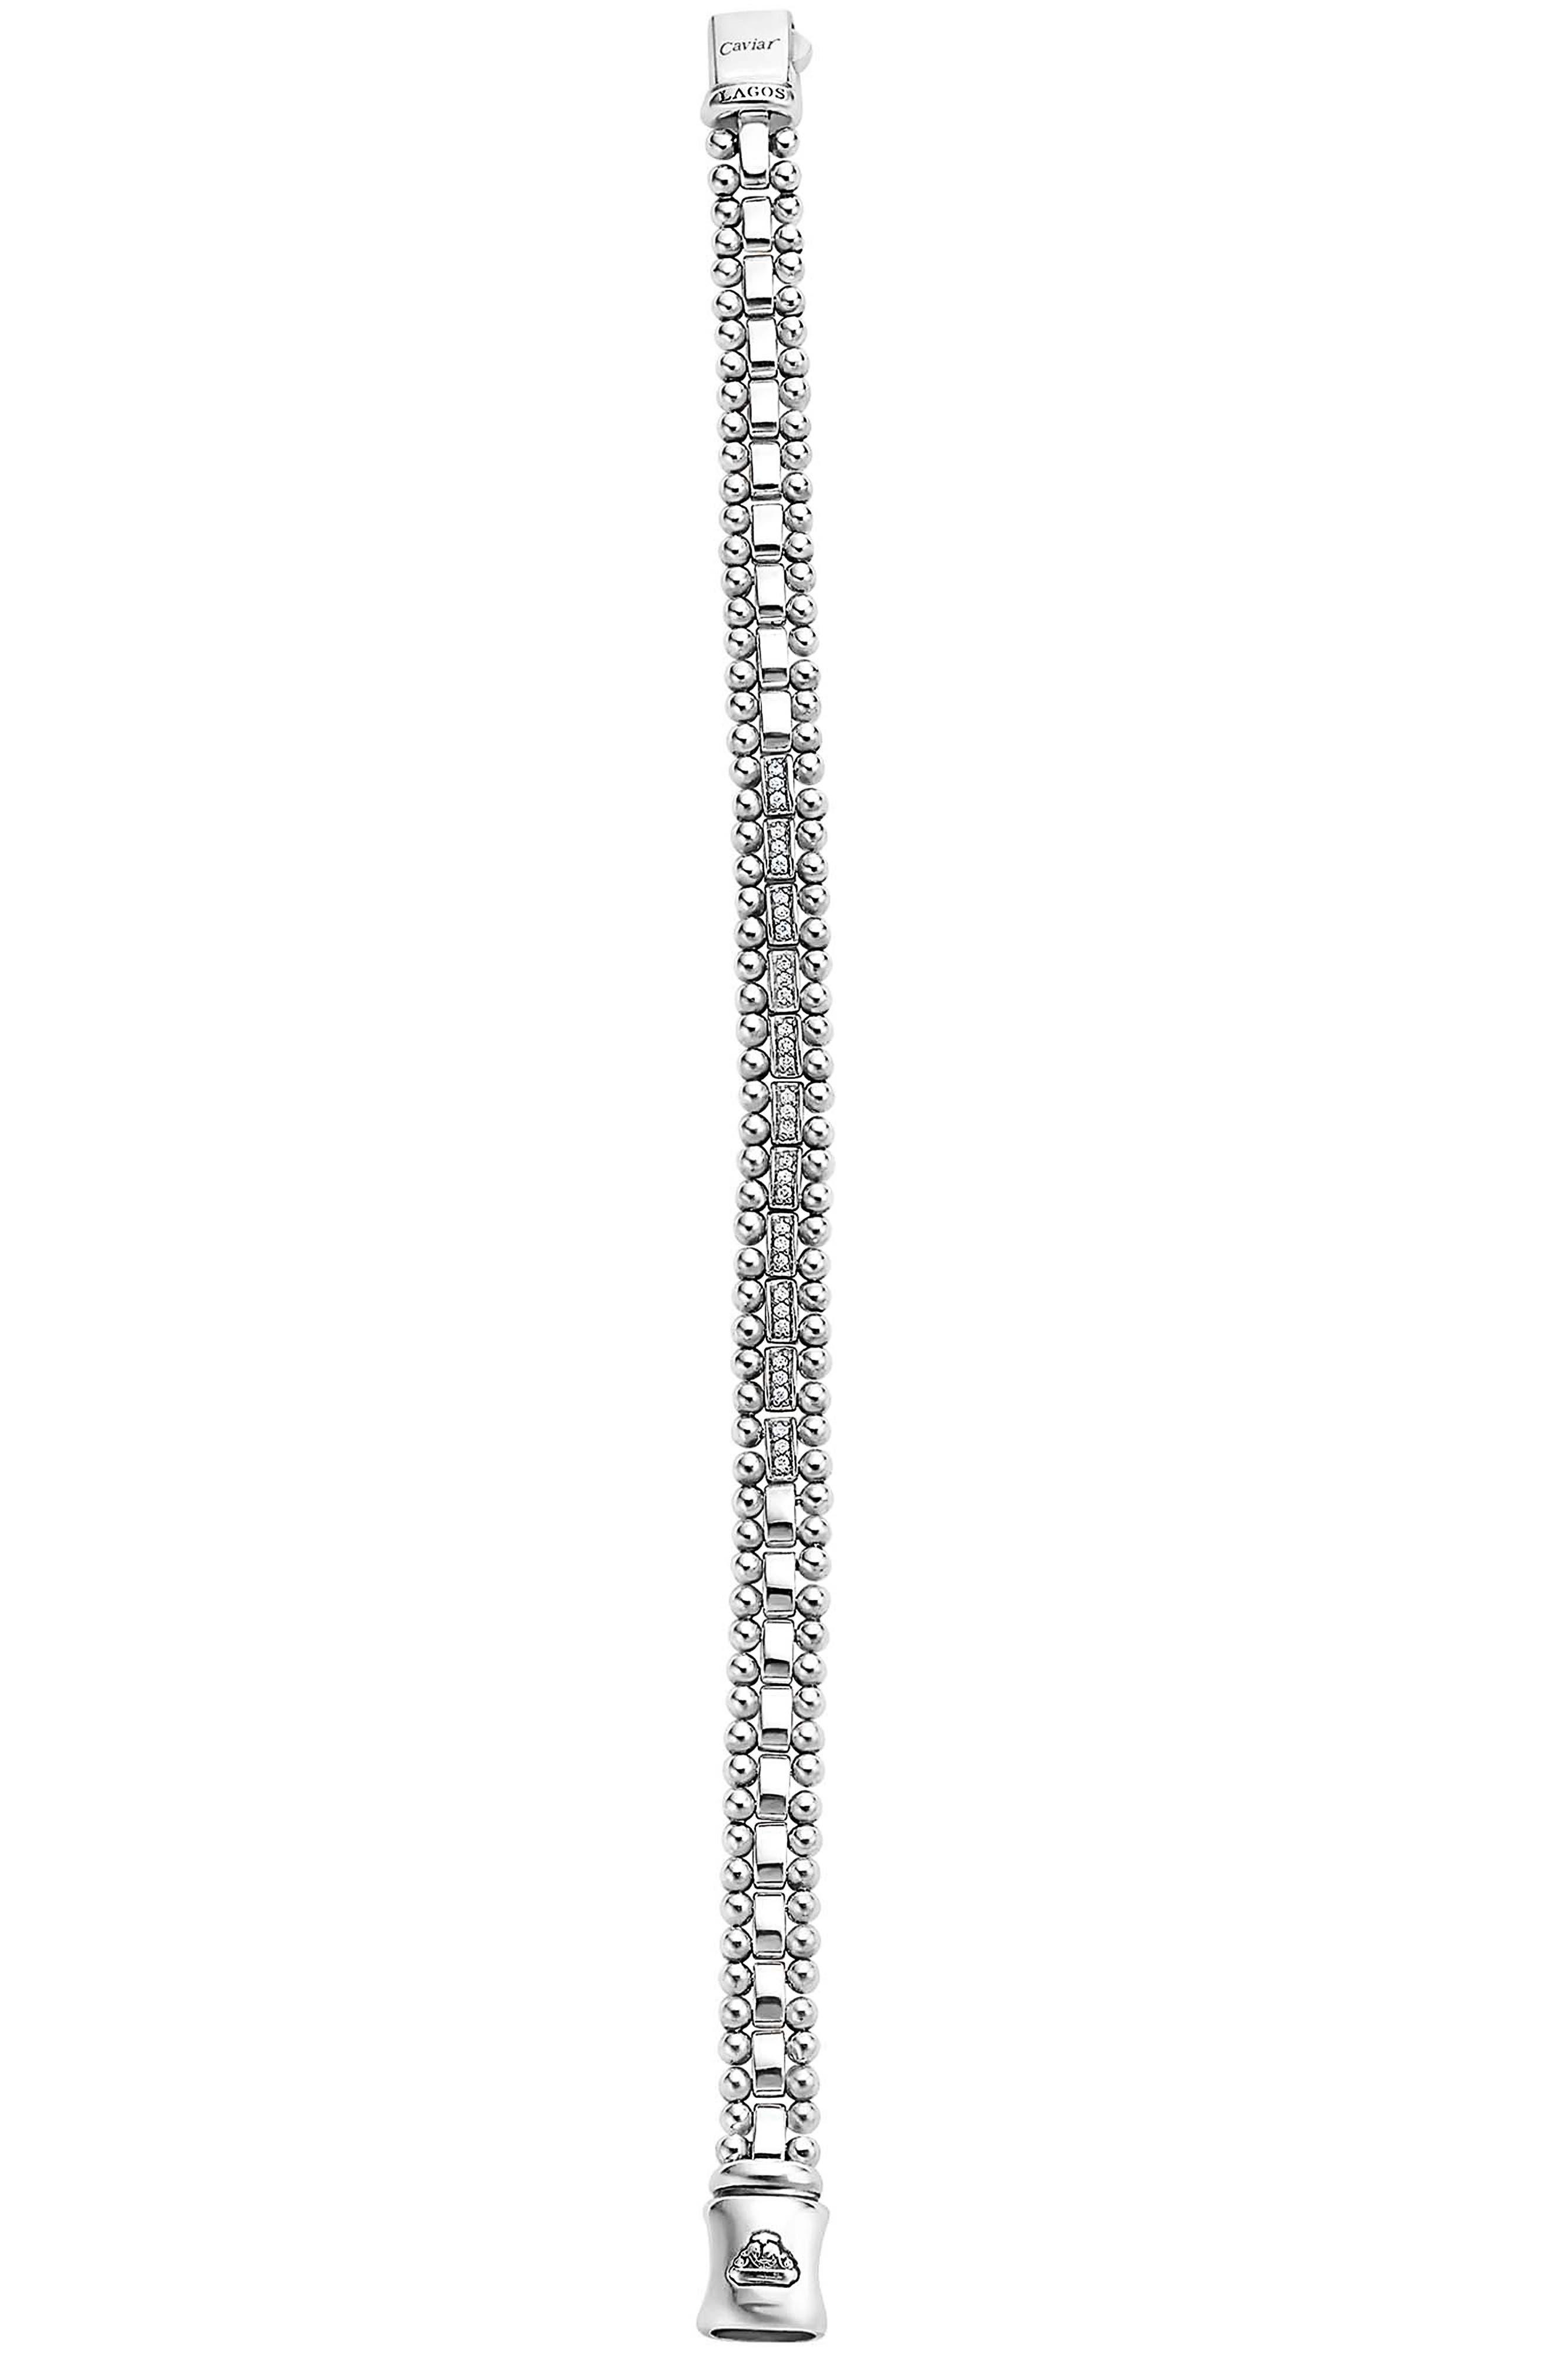 Caviar Spark Diamond Link Bracelet,                             Alternate thumbnail 2, color,                             SILVER/ DIAMOND